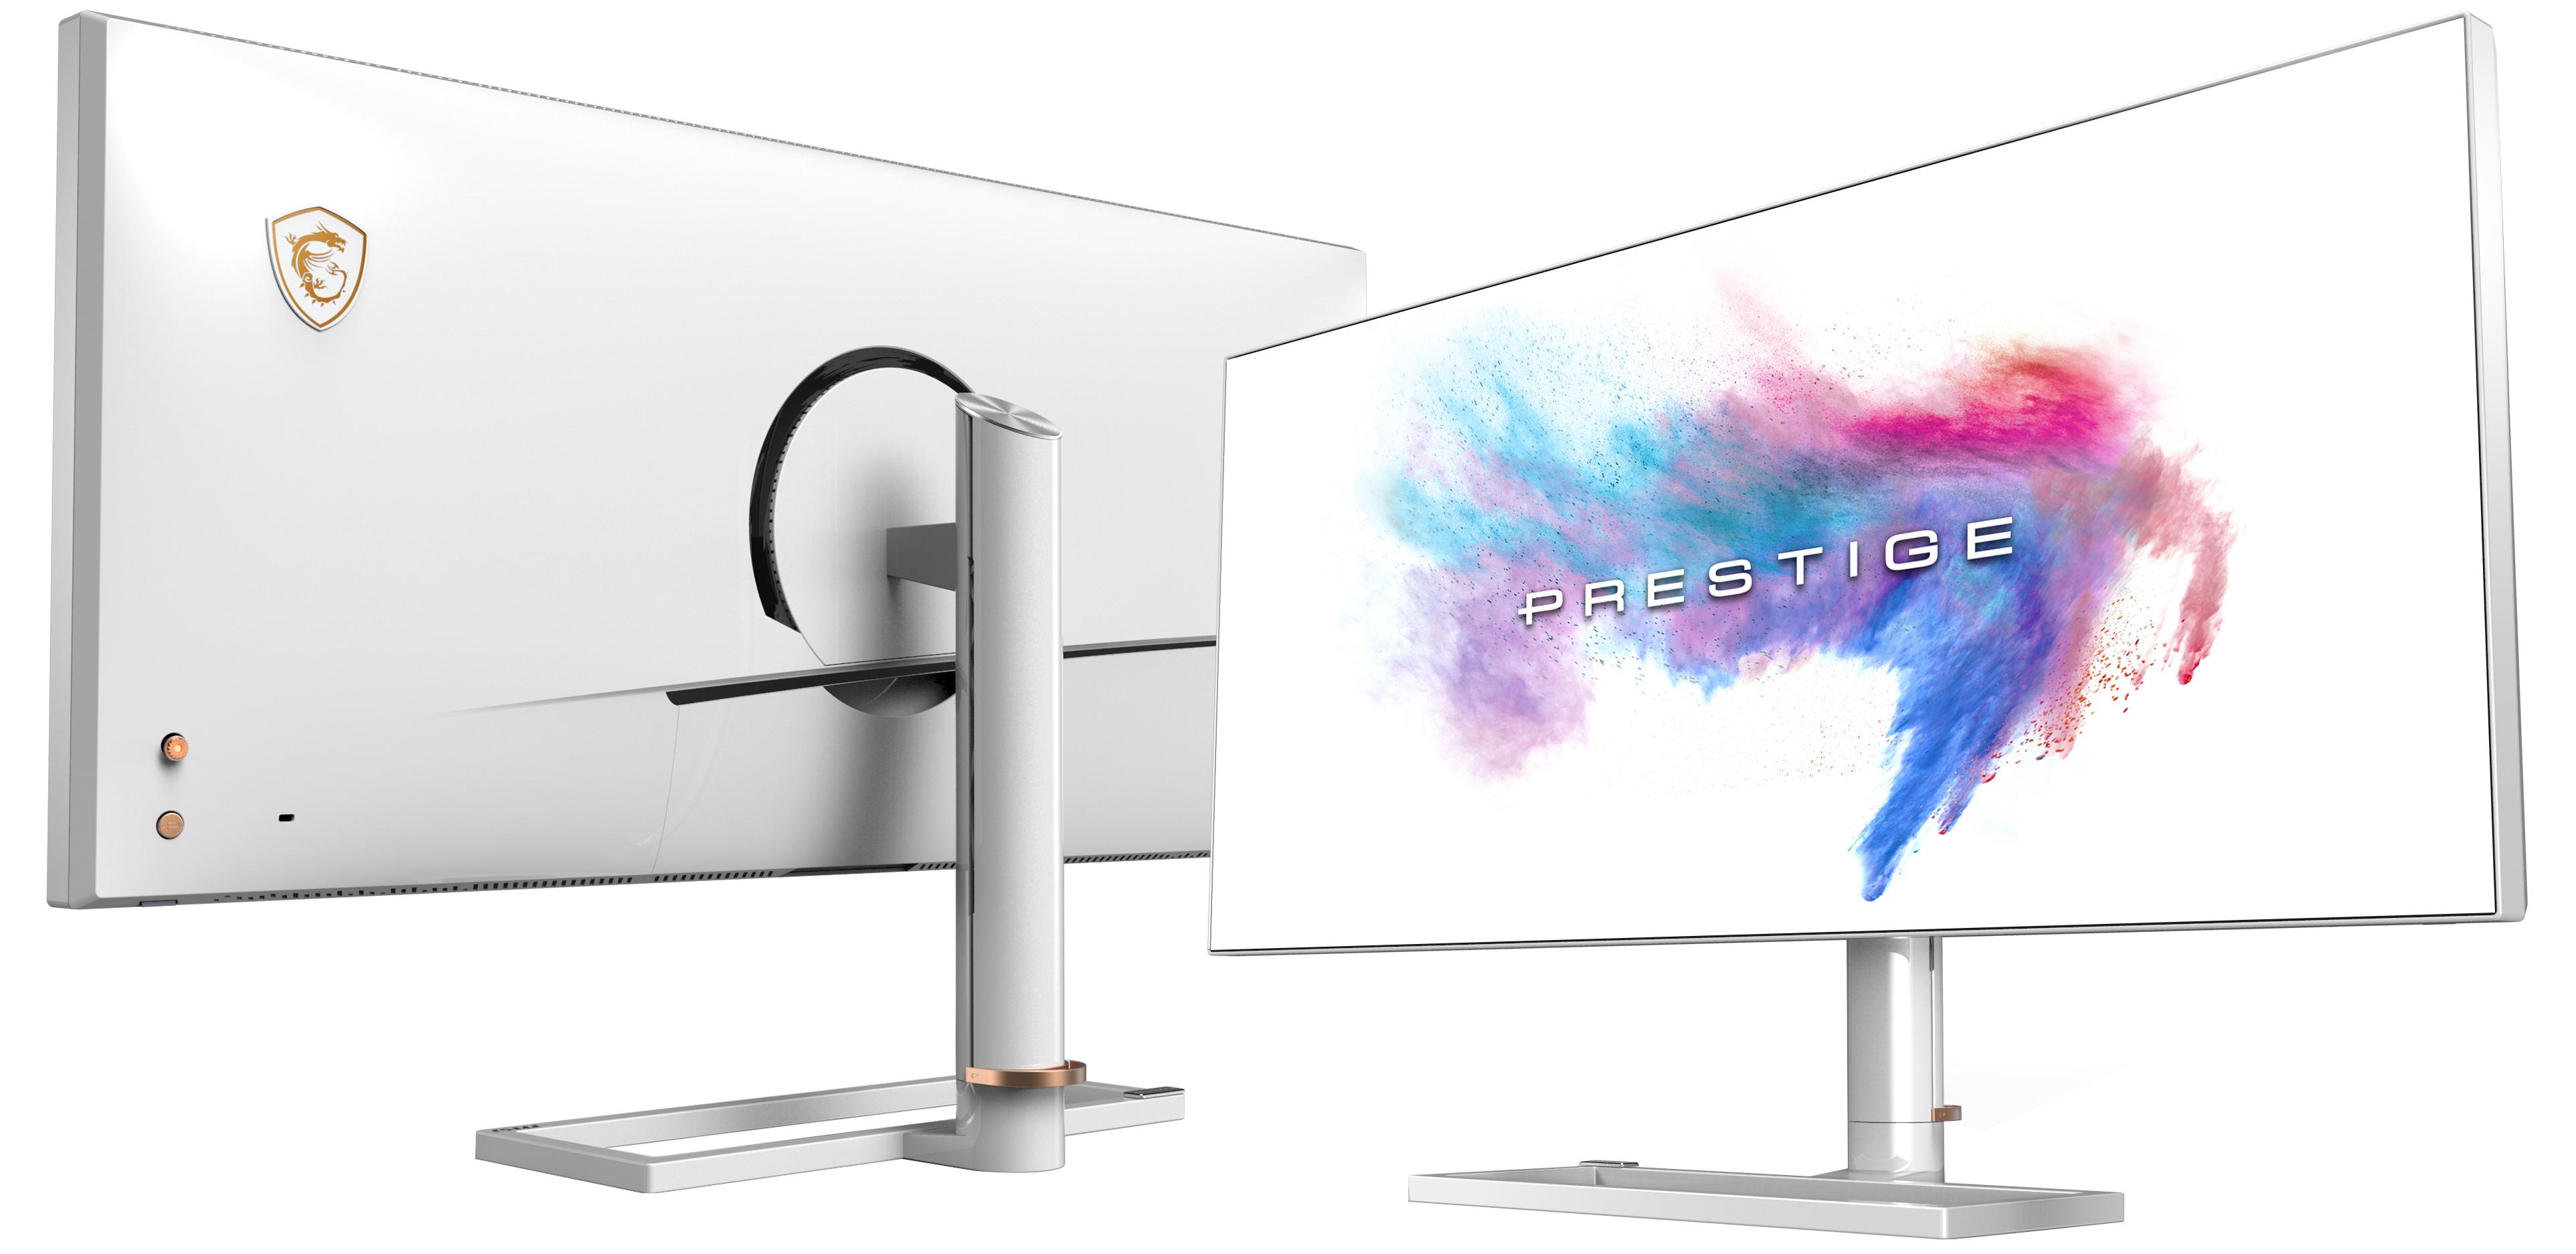 Prestige PS341WU Creator's Monitor